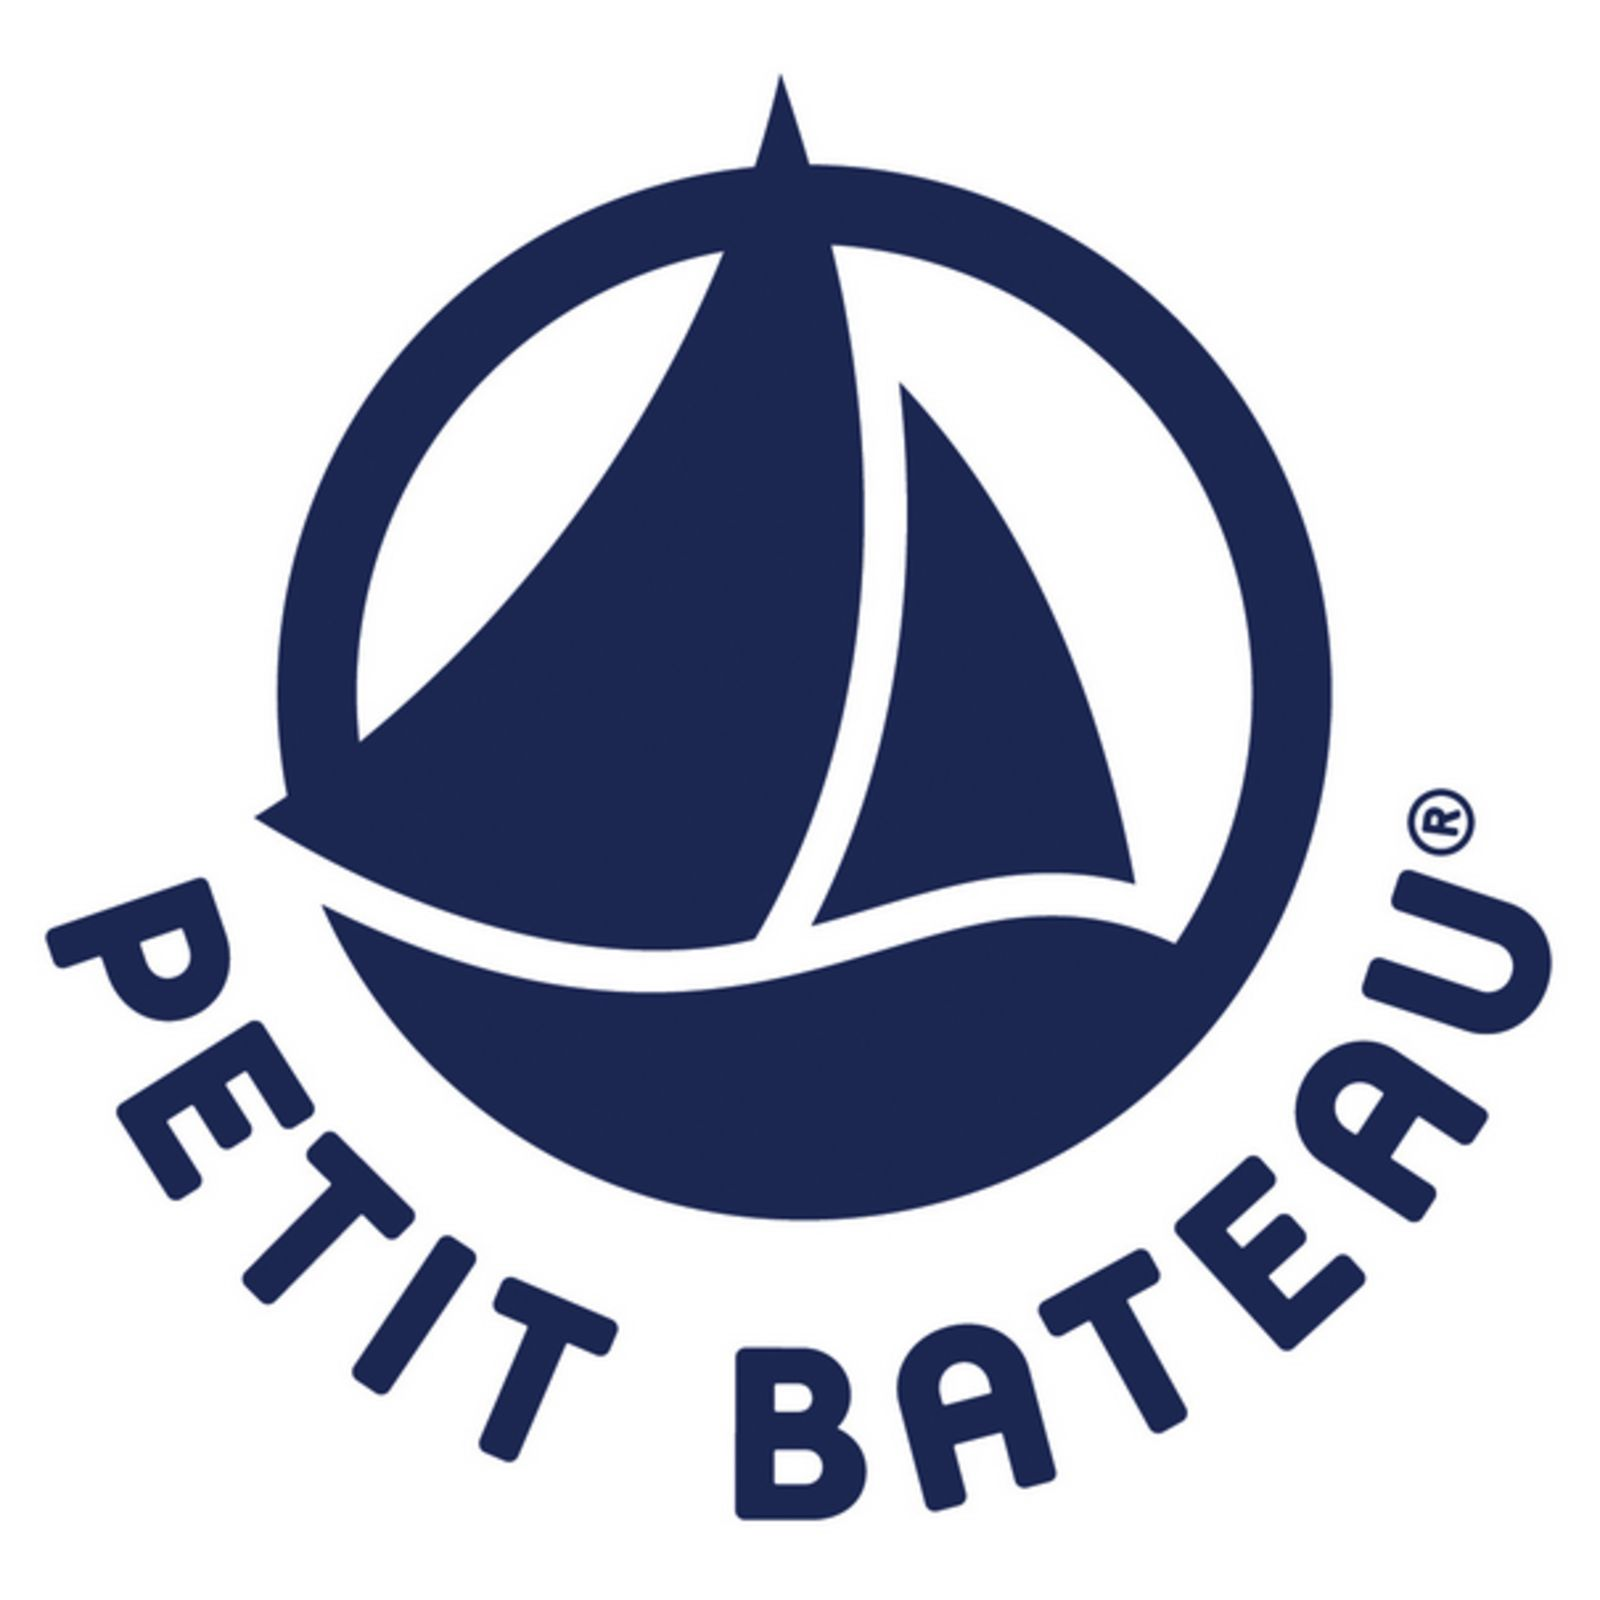 Petit Bateau (Afbeelding 1)